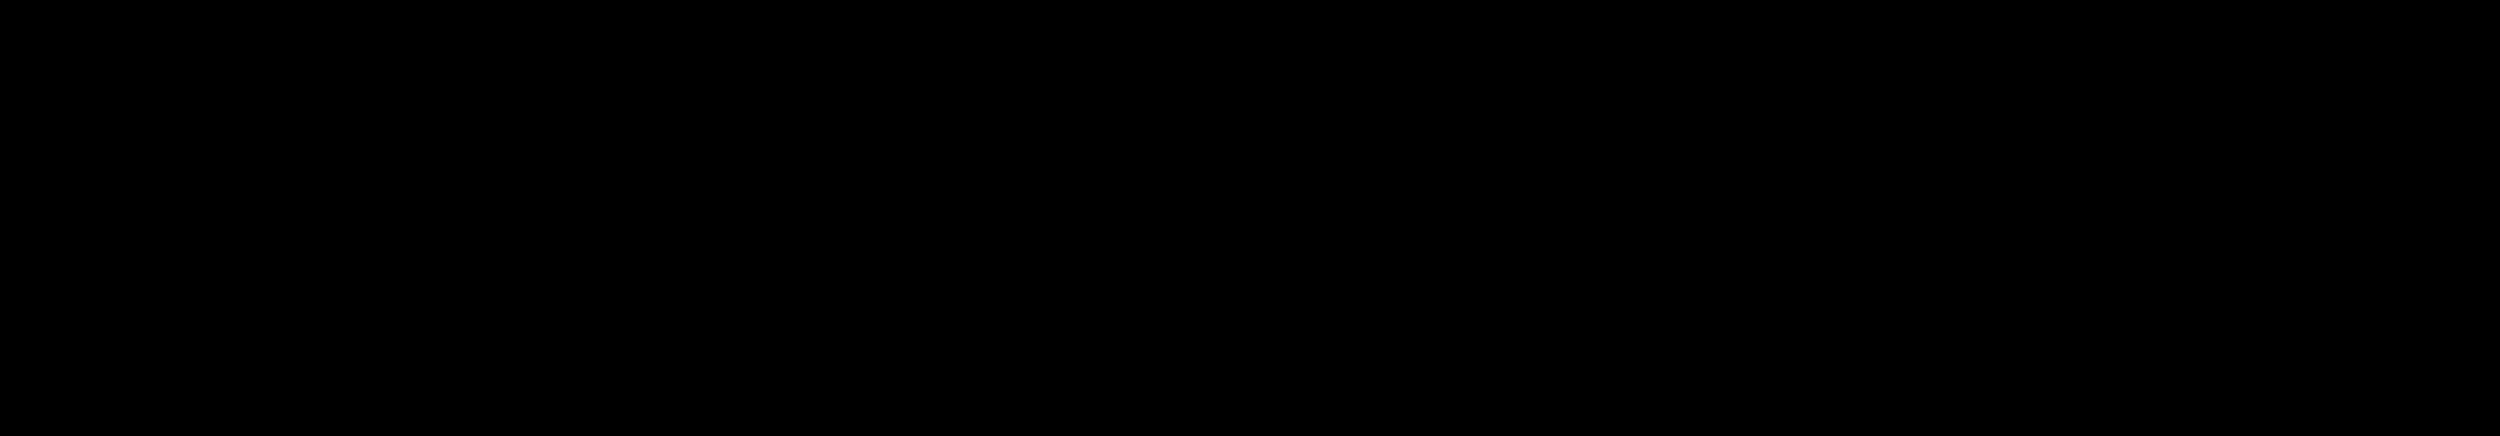 MF_logo copy.png